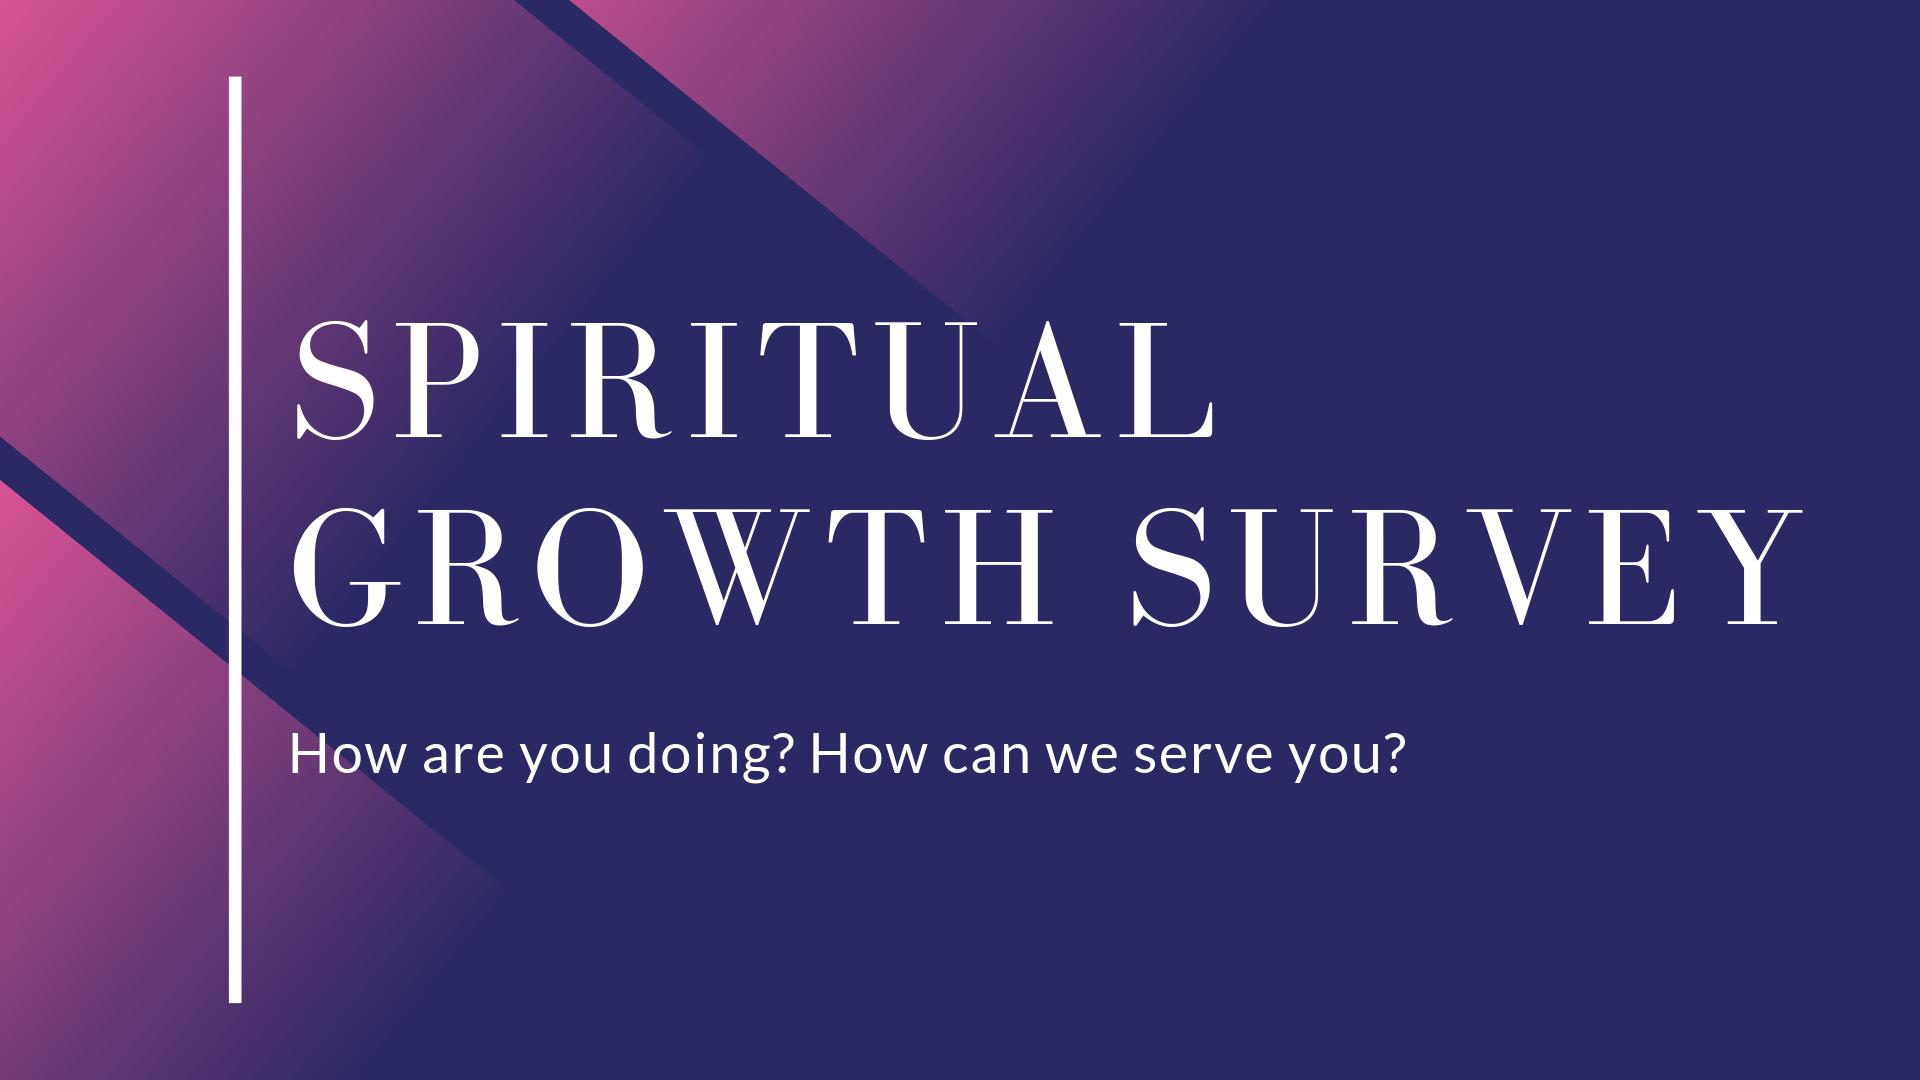 Spiritual growth survey.png